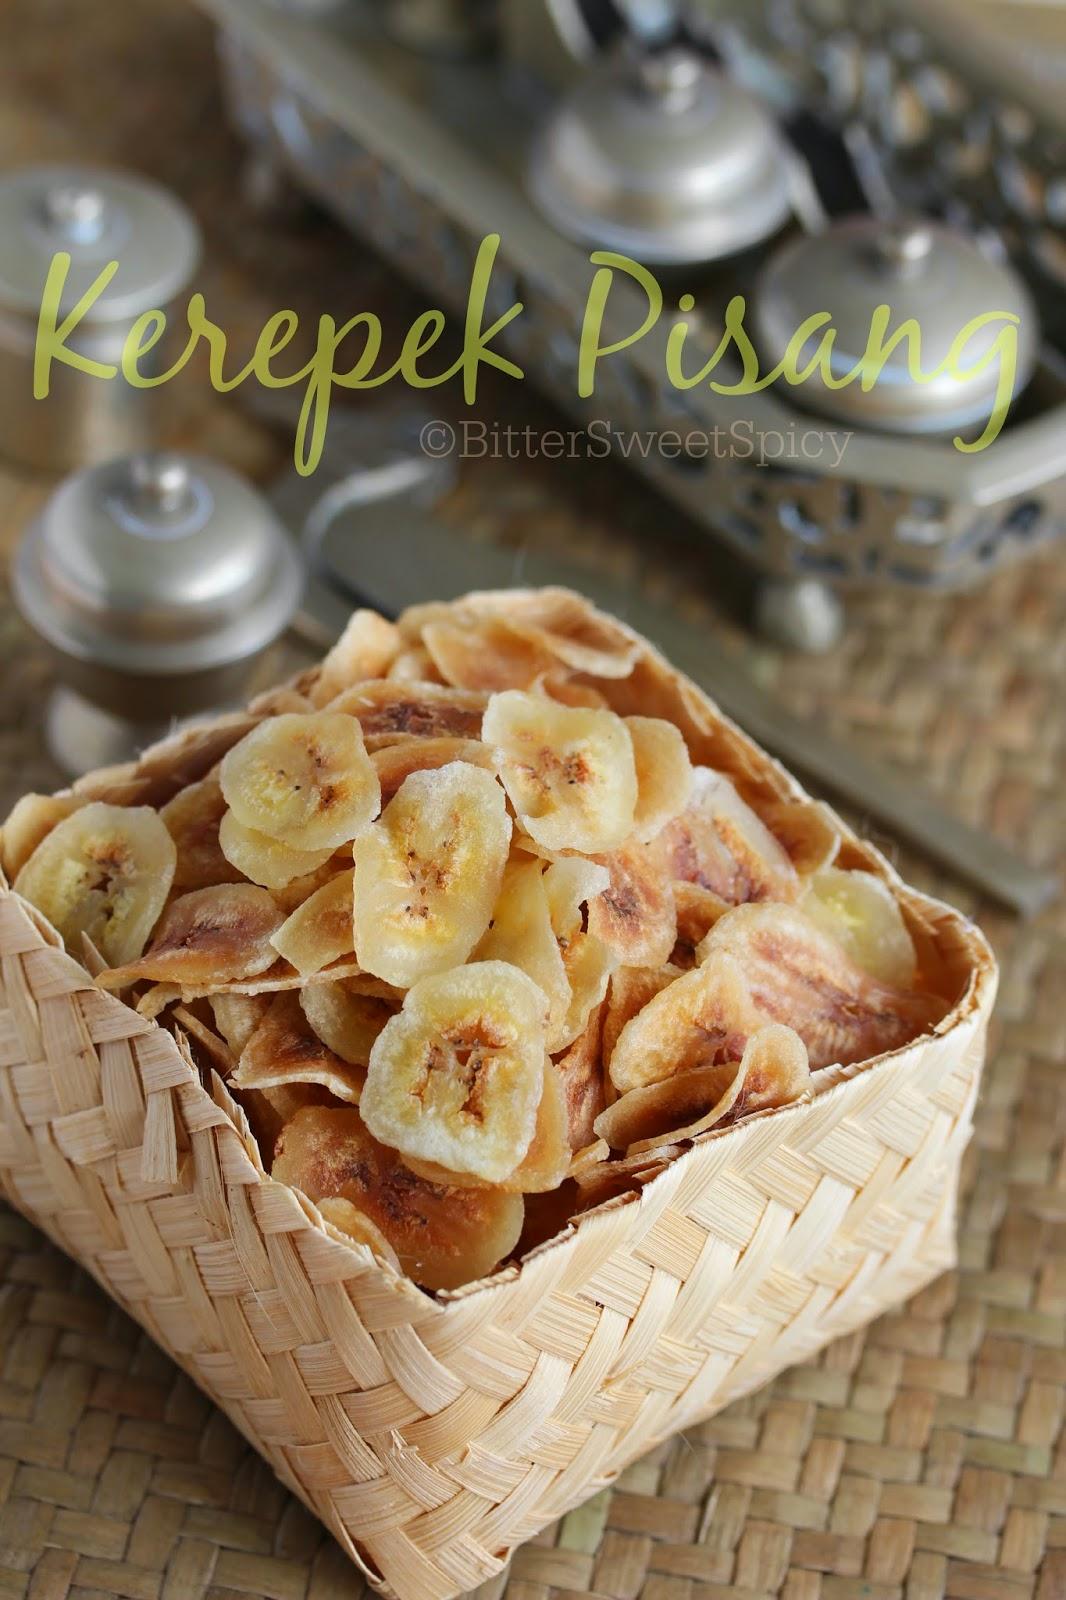 BitterSweetSpicy: Banana Chips aka Kerepek Pisang